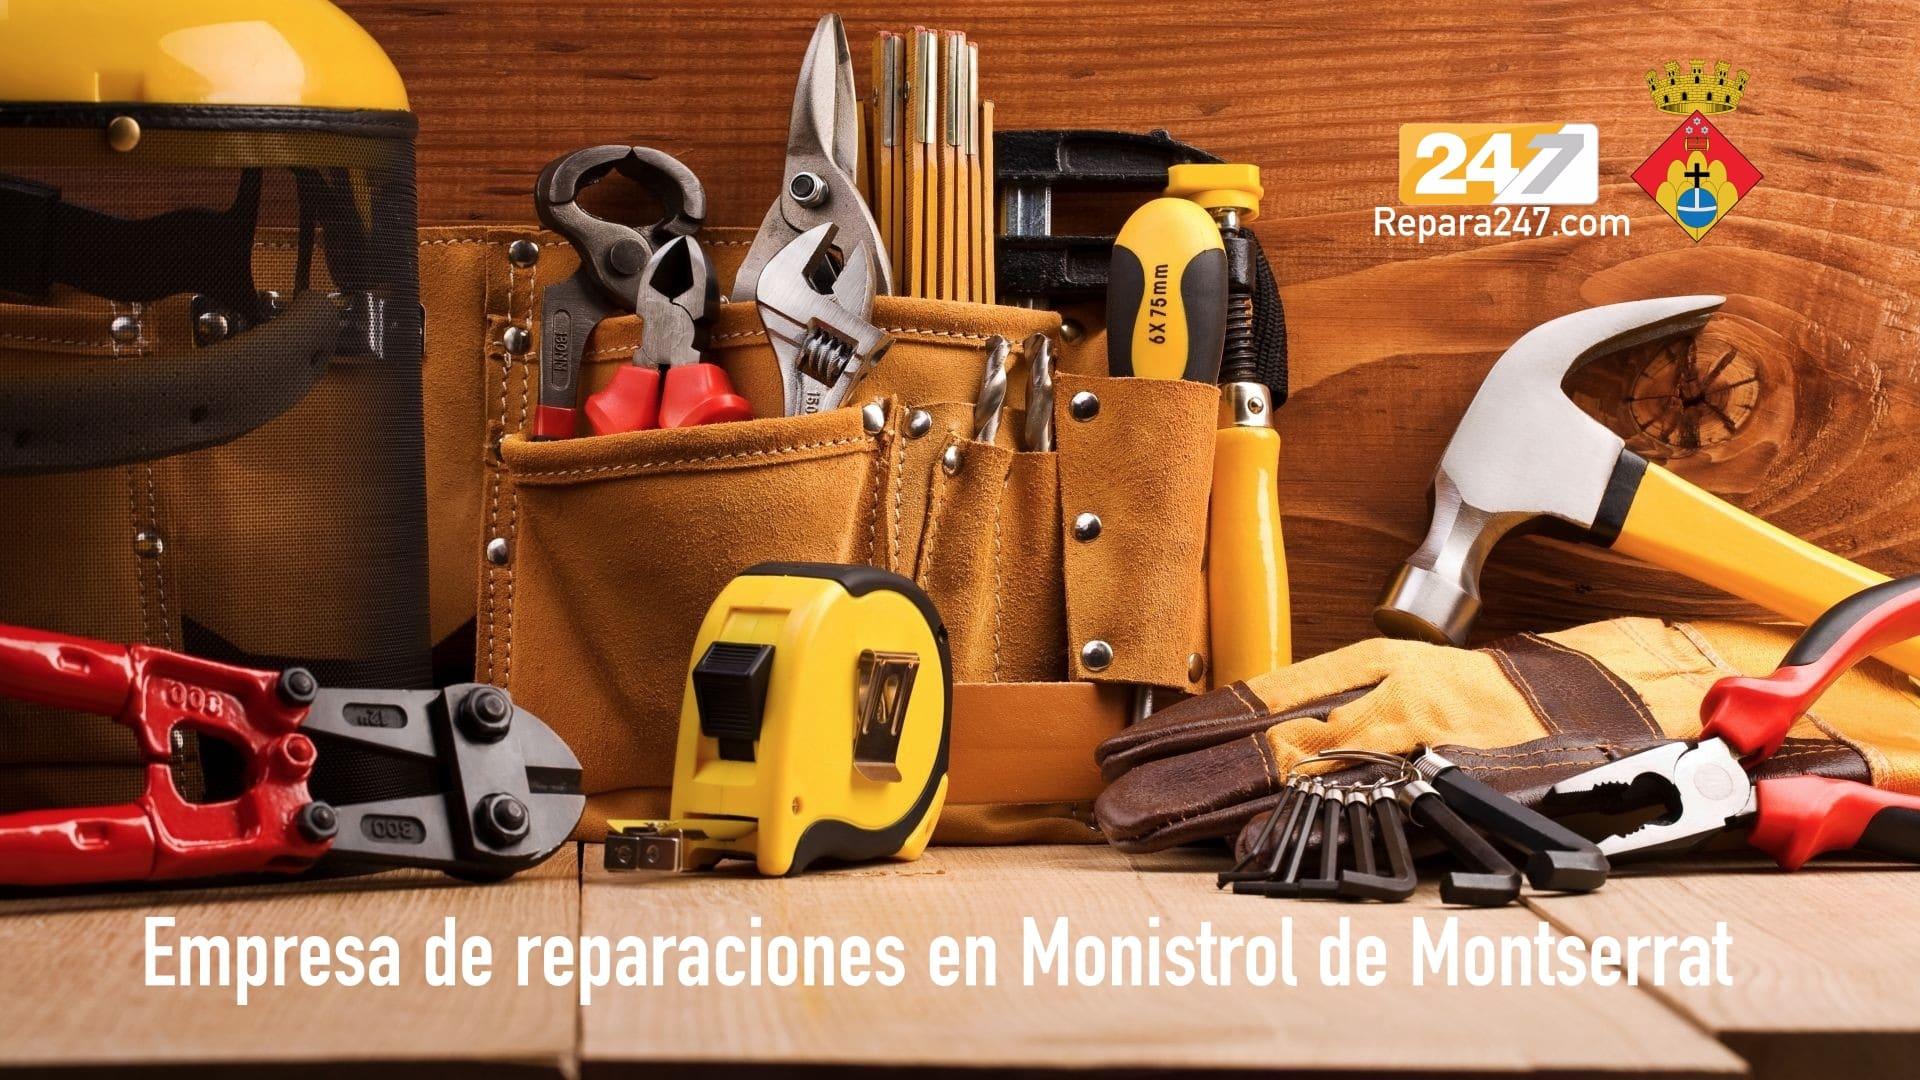 Empresa de reparaciones en Monistrol de Montserrat